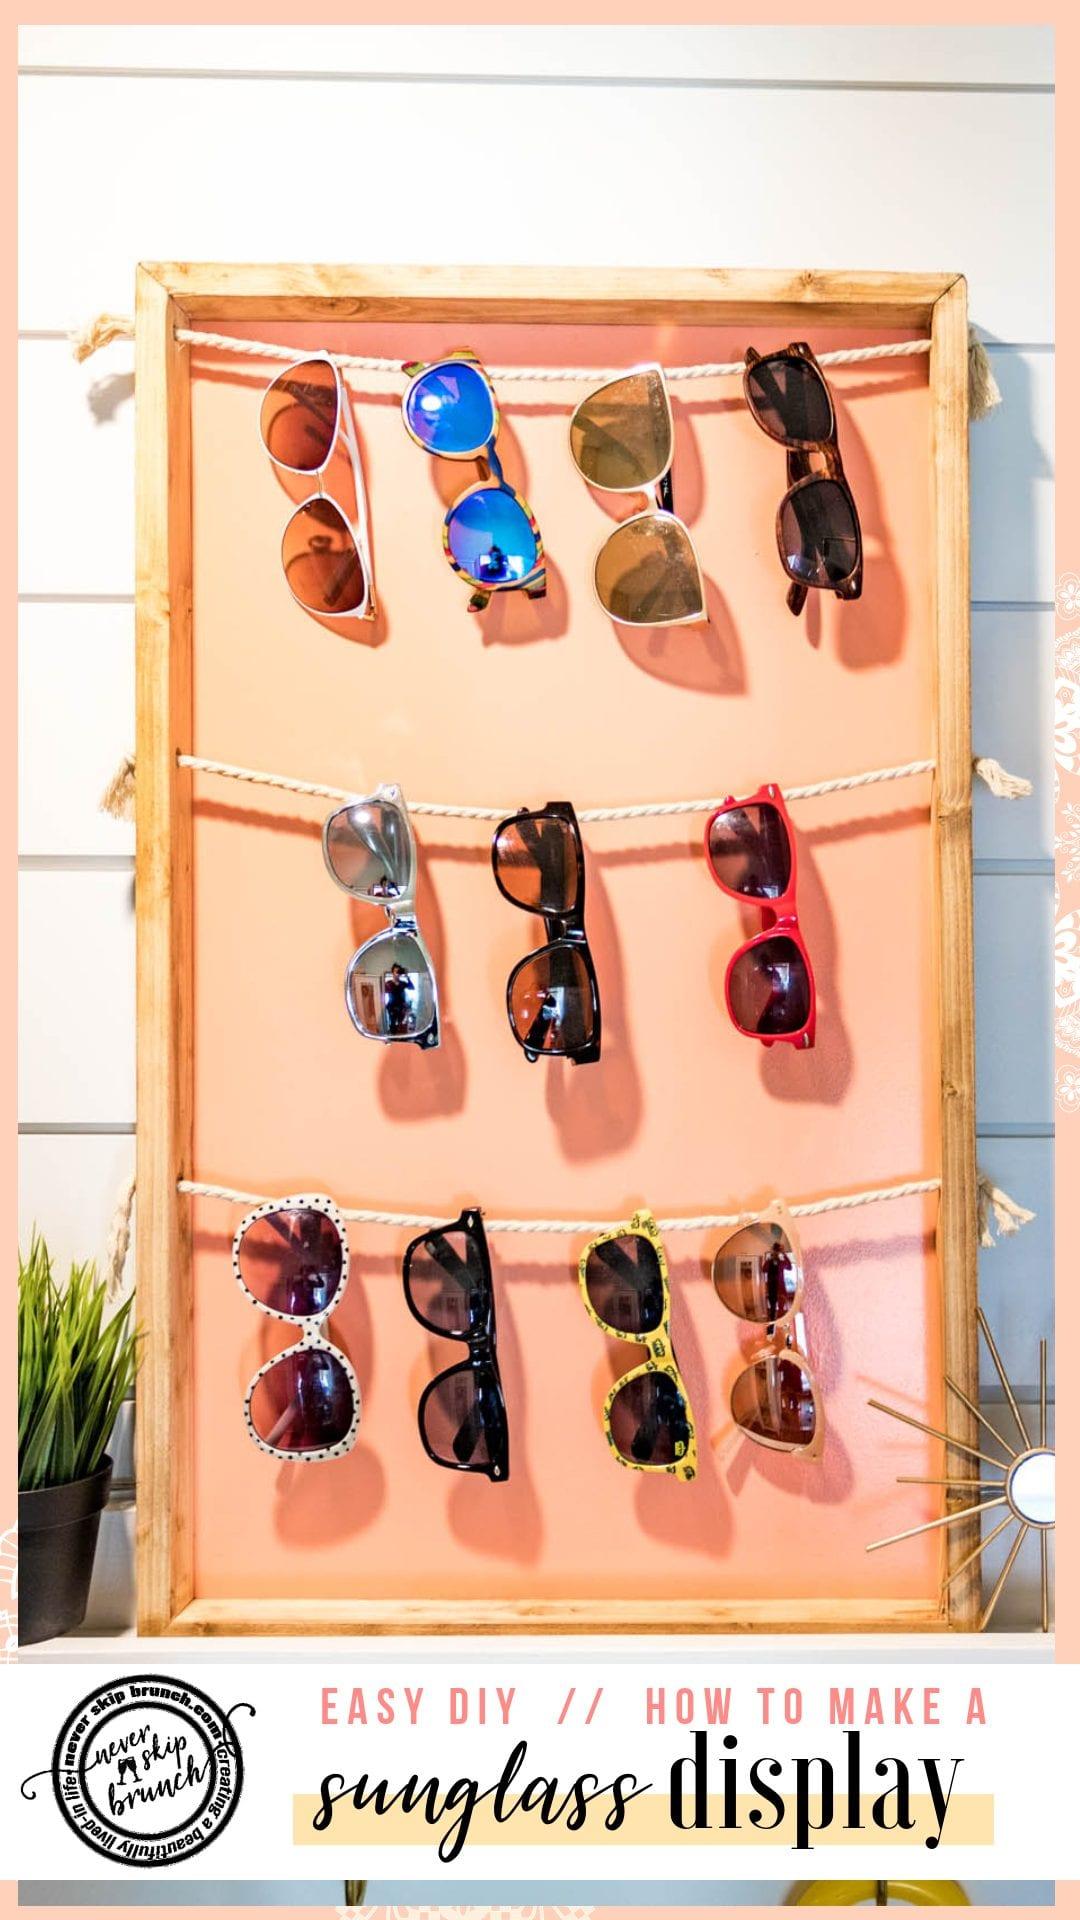 THIS IS GENIUS!! sunglasses holder diy   sunglasses holder diy display   sunglasses holder wall   sunglasses holder wall storage ideas   diy sunglass display   siy sunglass holder   home decor   DIY Home decor ideas   Never Skip Brunch by Cara Newhart   #decor #diy #summer #neverskipbrunch